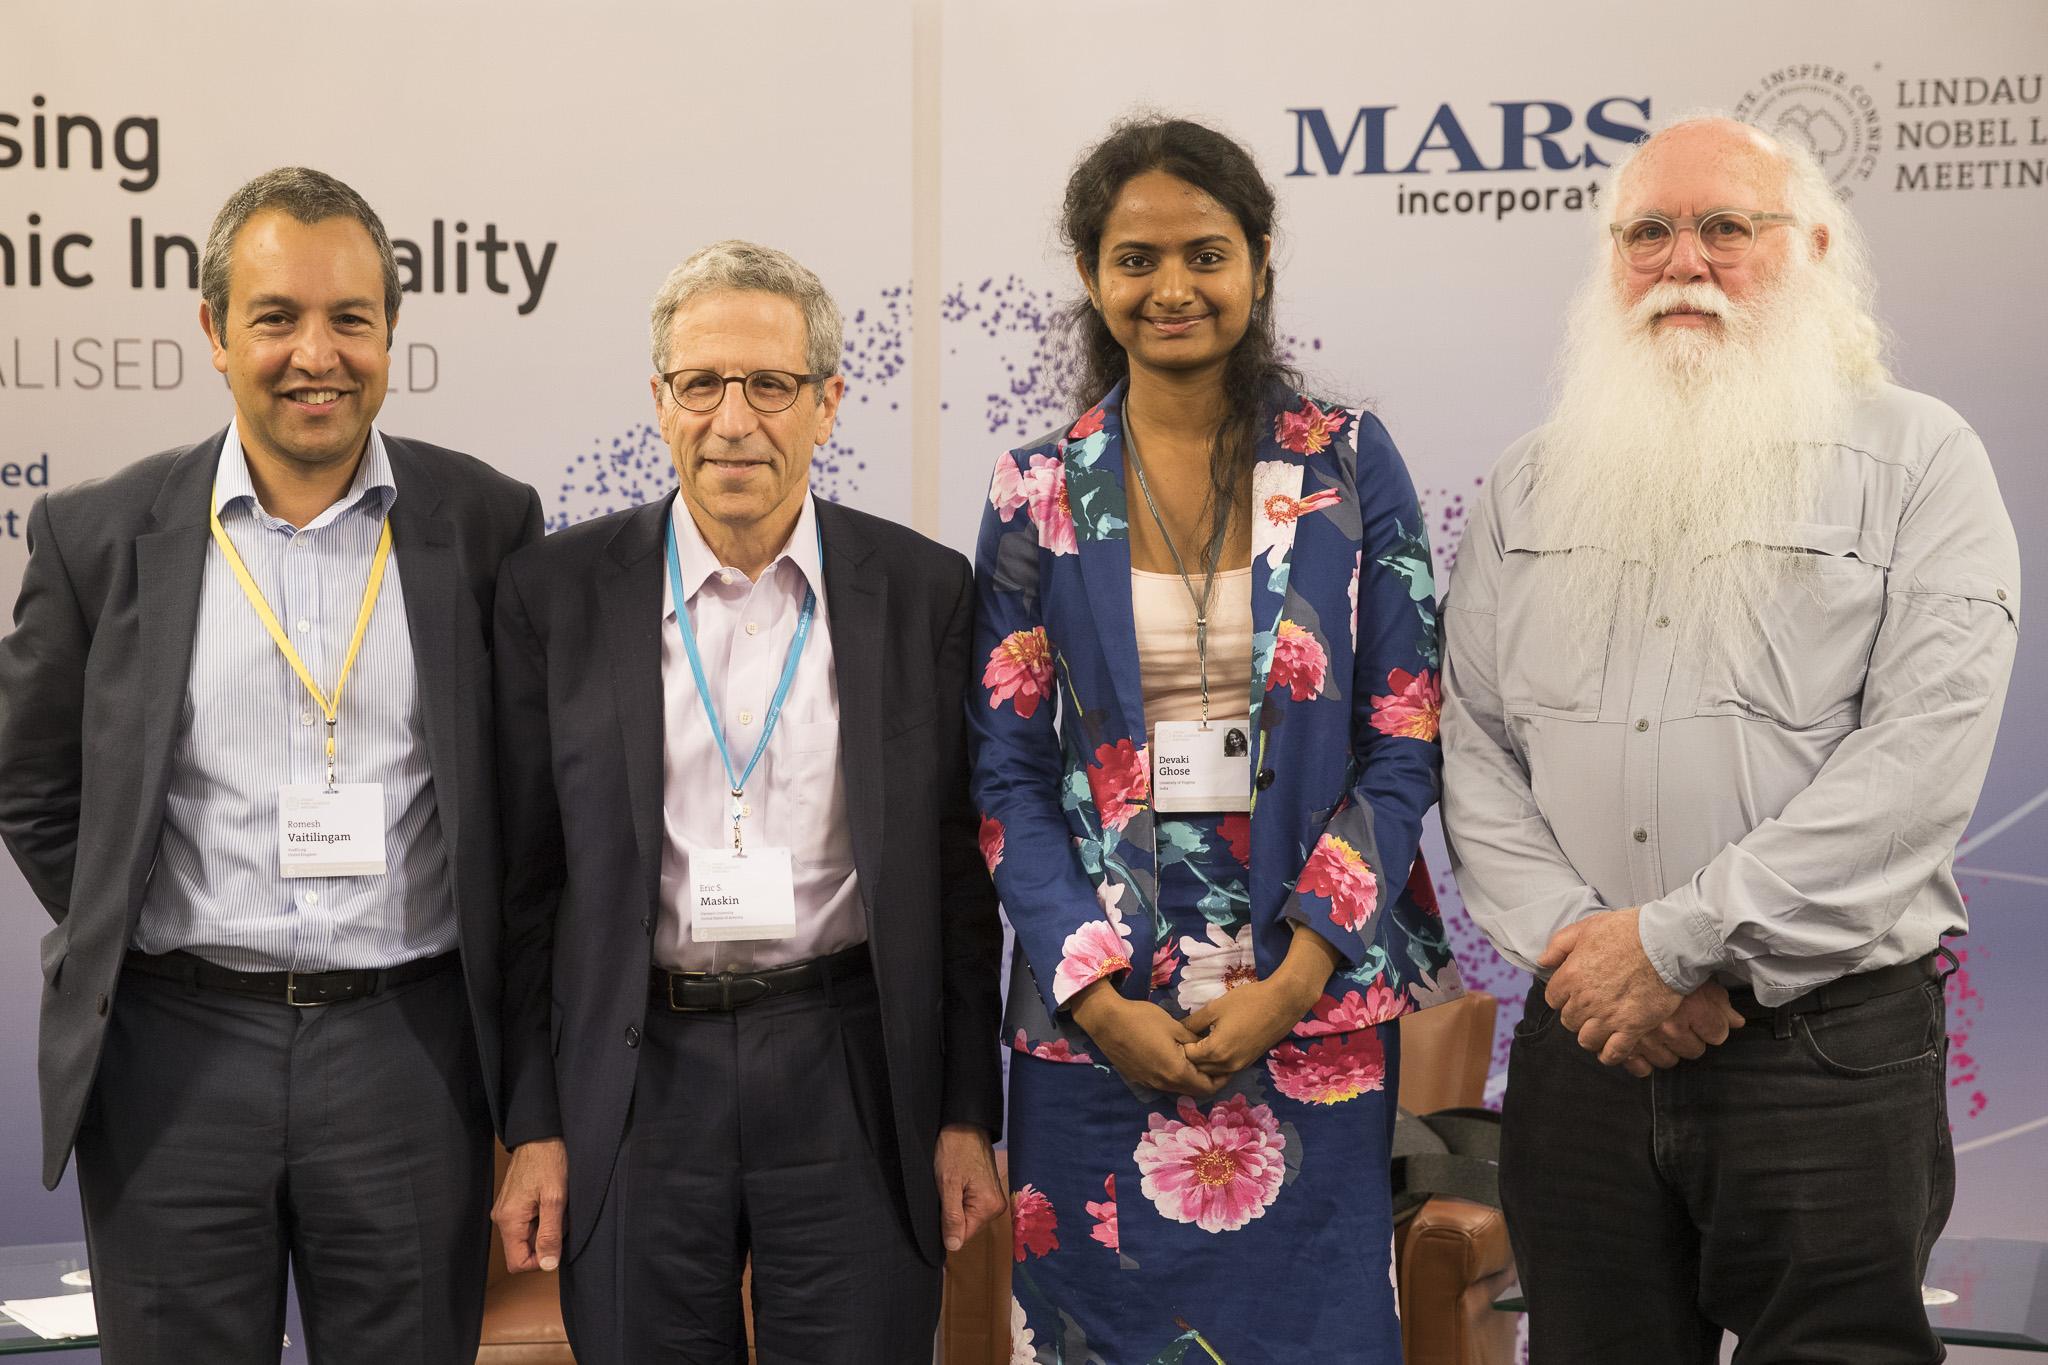 I was discussing economic inequality at the 6th Lindau Meeting on Economic Sciences with economists Romesh Vaitilingam, Eric Maskin (Nobel Laureate) and Devaki Ghose.